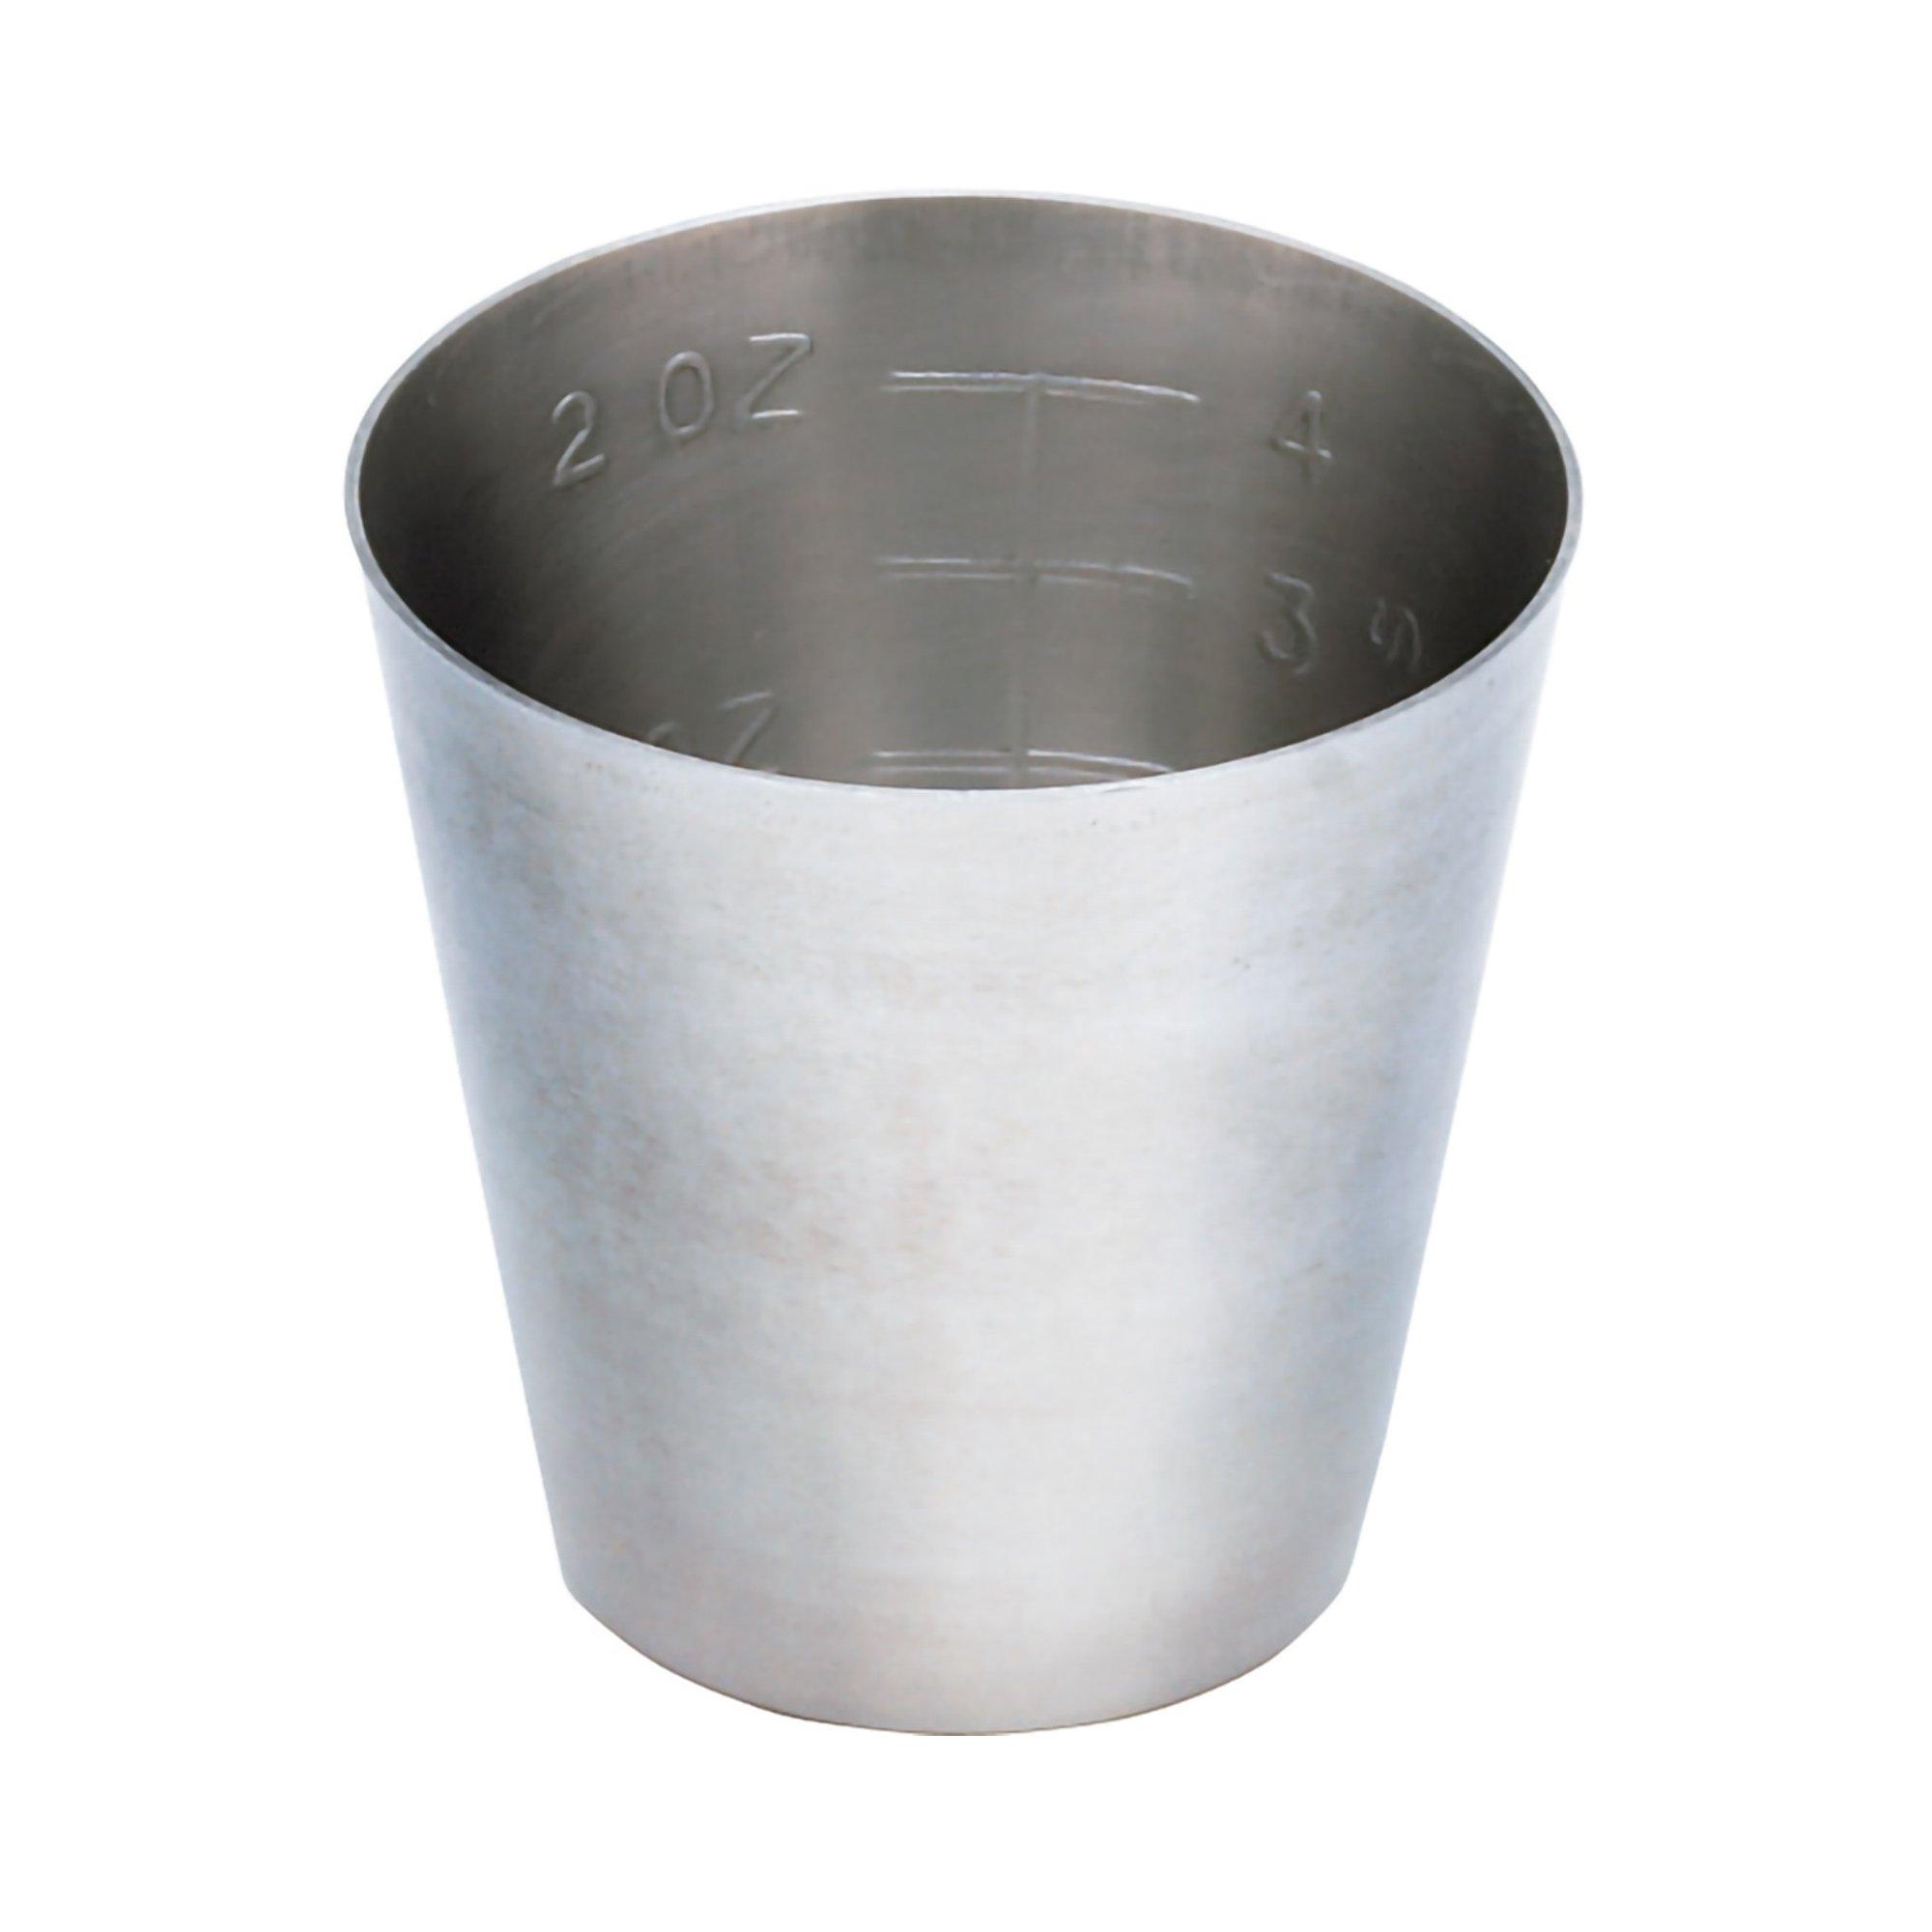 McKesson Argent Medicine Cup, 2oz., Stainless Steel, Reusable, 43-1-015, 1 Each